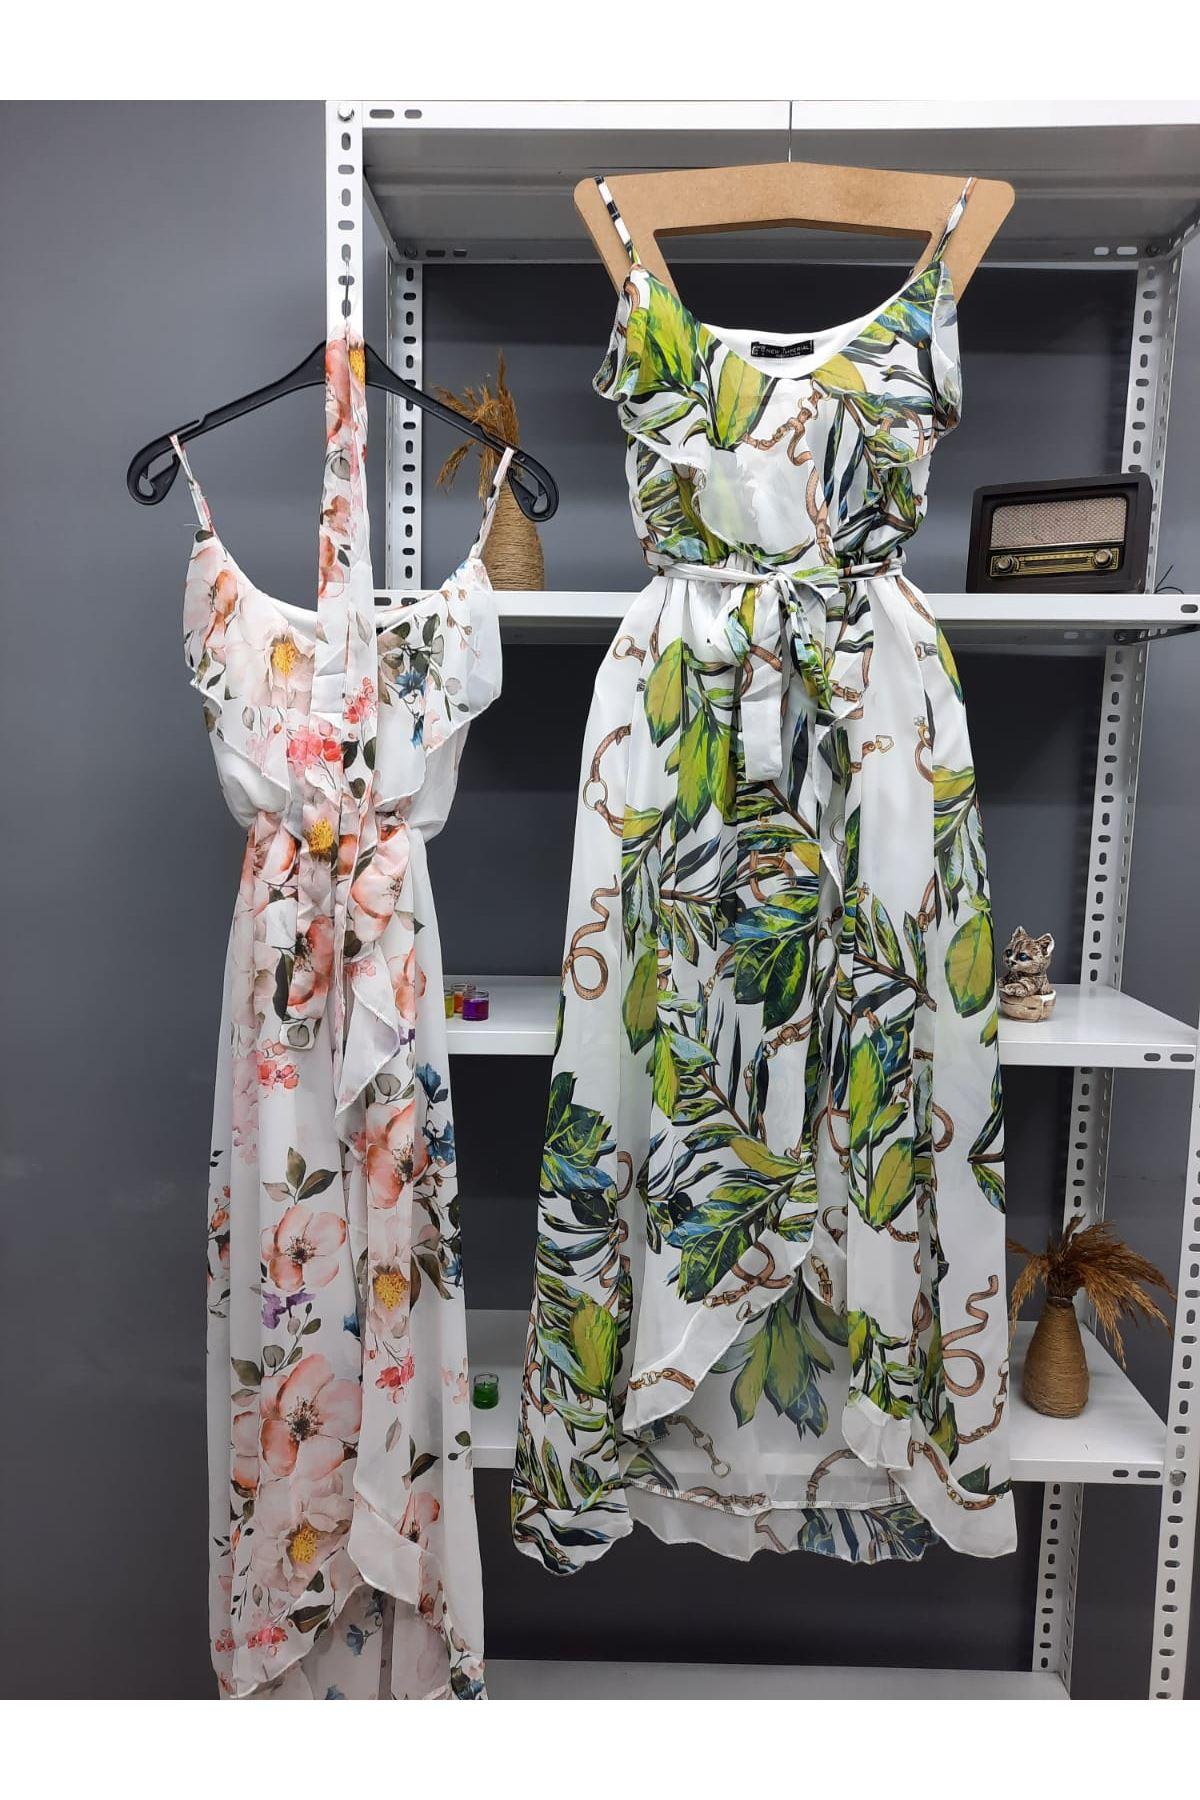 Volan Detaylı Astarlı İthal Şifon Elbise - YEŞİL